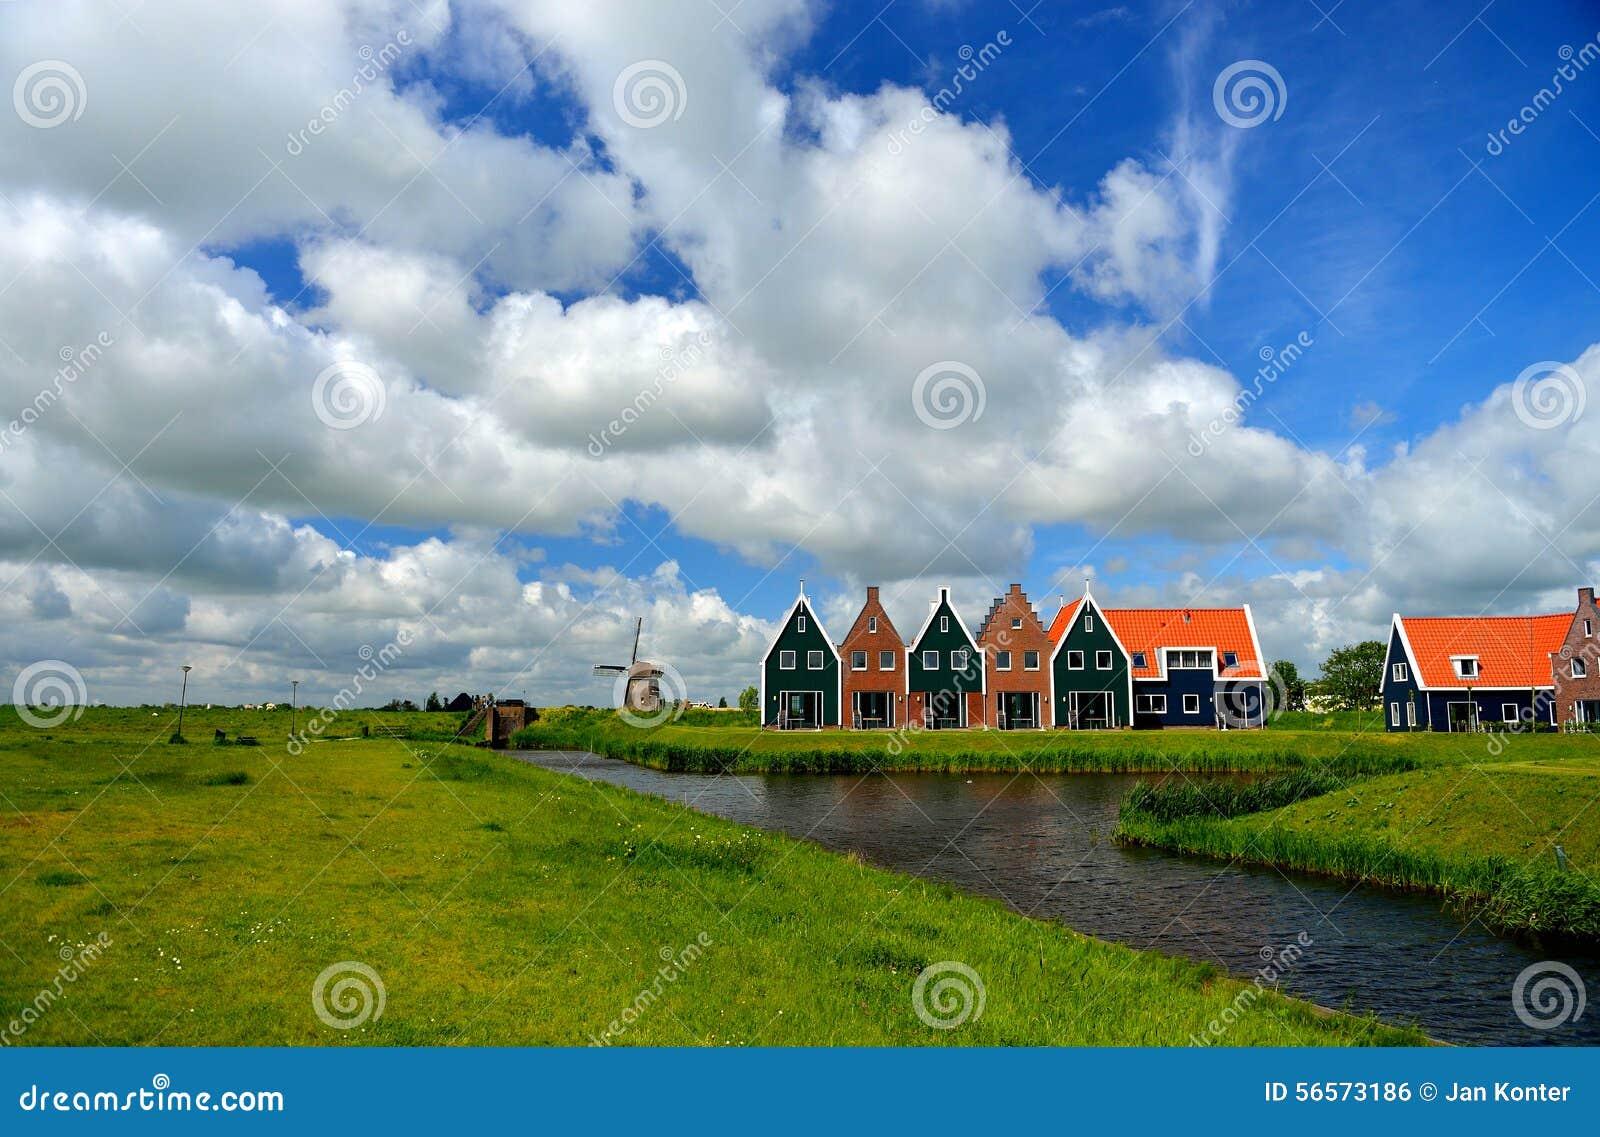 Download Πάρκο Volendam, Ολλανδία μαρινών Στοκ Εικόνες - εικόνα από ολλανδία, ολλανδικά: 56573186